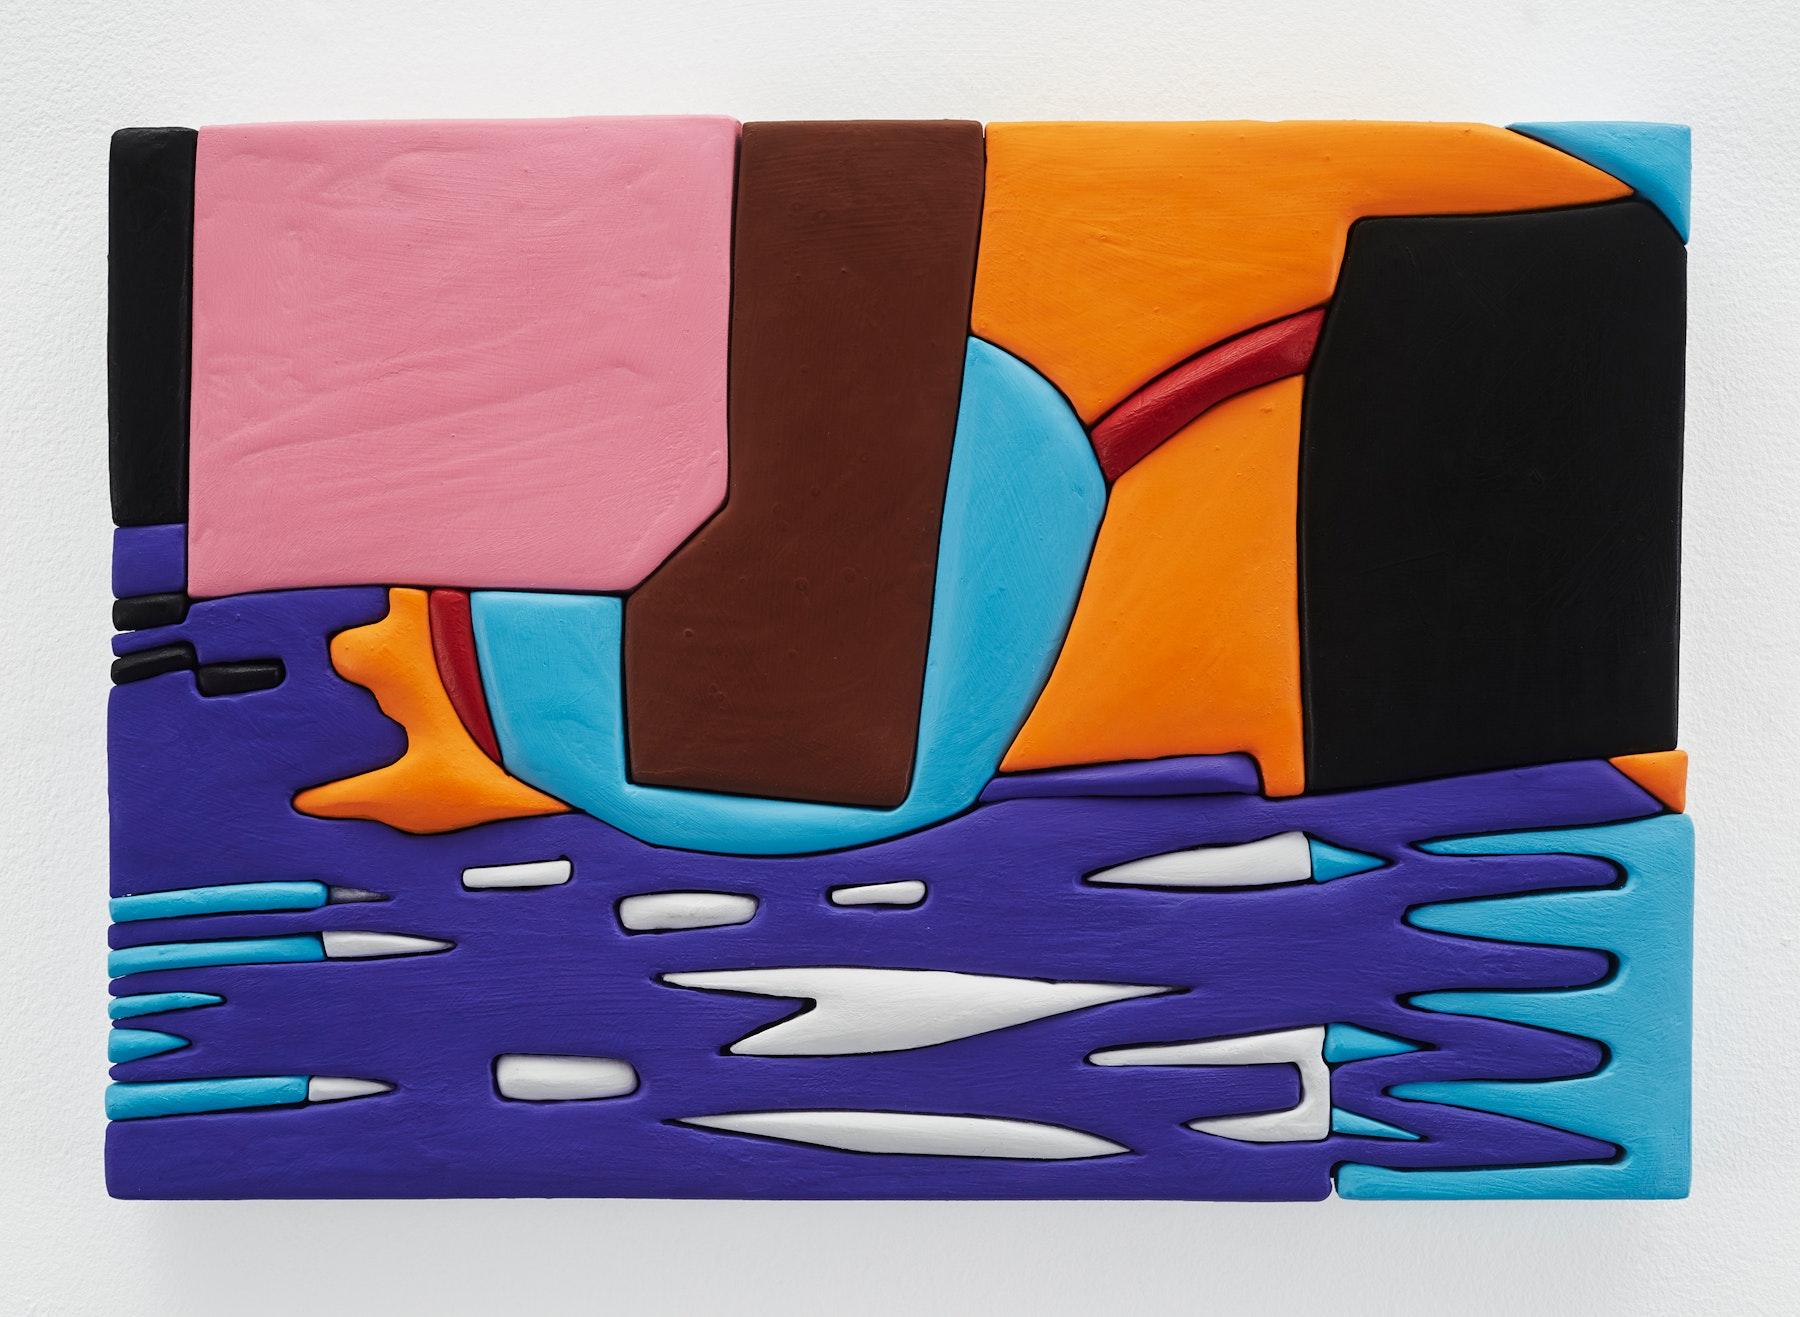 "Sadie Benning ""Untitled 11x16 (XX),"" 2019 Wood, aqua resin, casein, and acrylic gouache 11 x 16"" [HxW] (27.94 x 40.64 cm) Inventory #BEN851 Courtesy of the artist and Vielmetter Los Angeles Photocredit: Chris Austin"